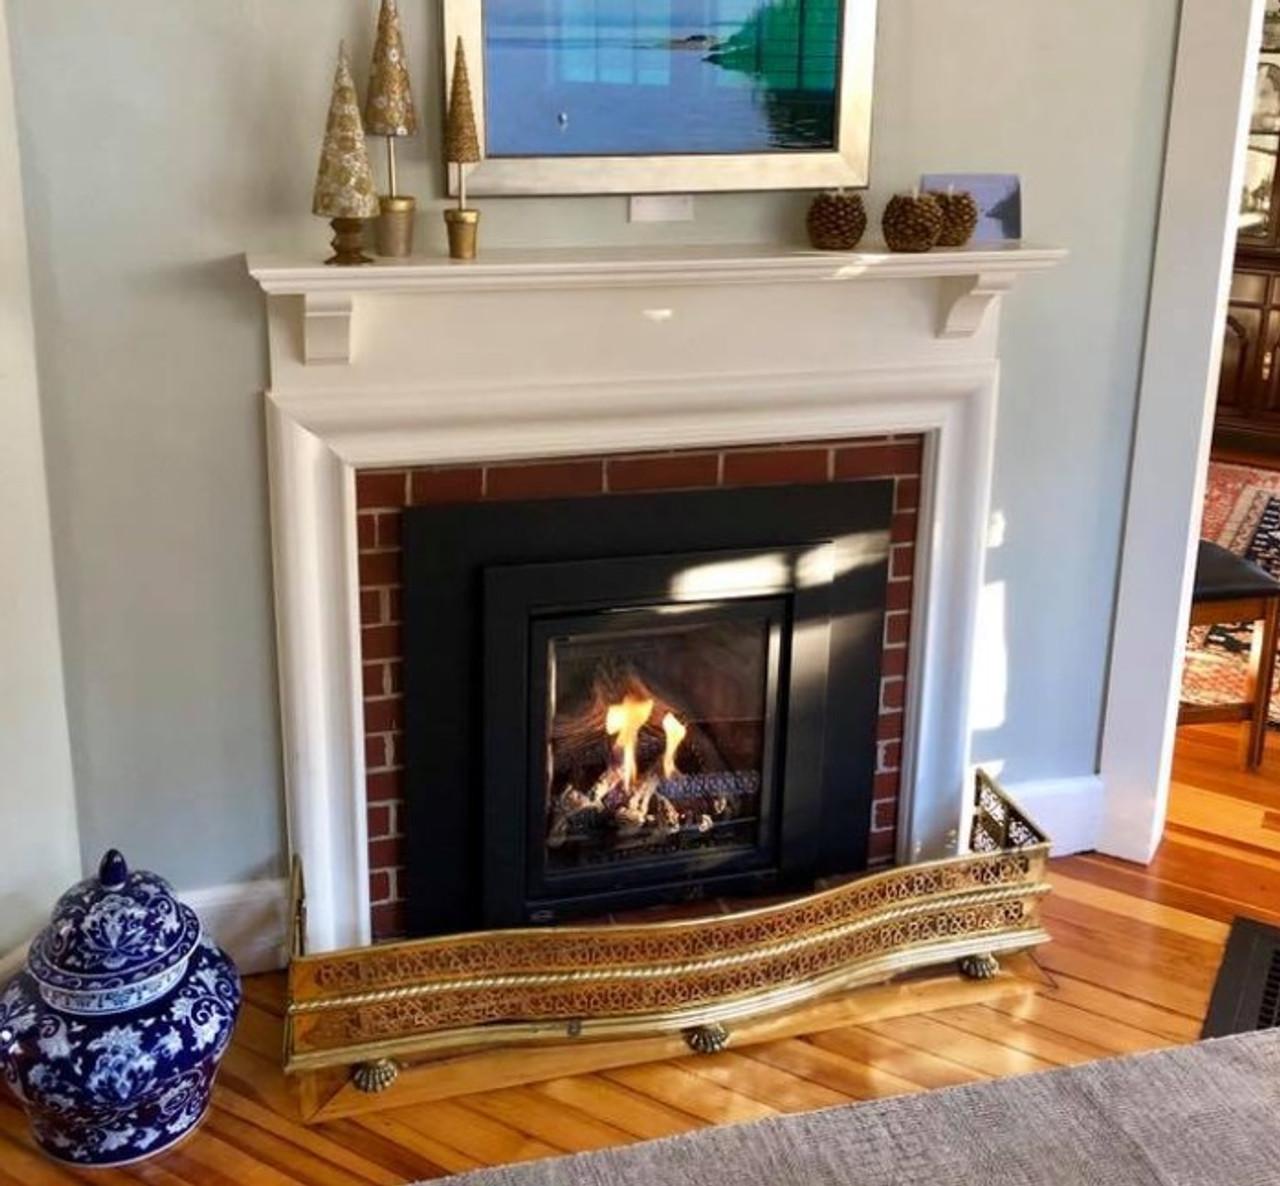 Enviro Q1 Gas Fireplace & Fireplace Insert